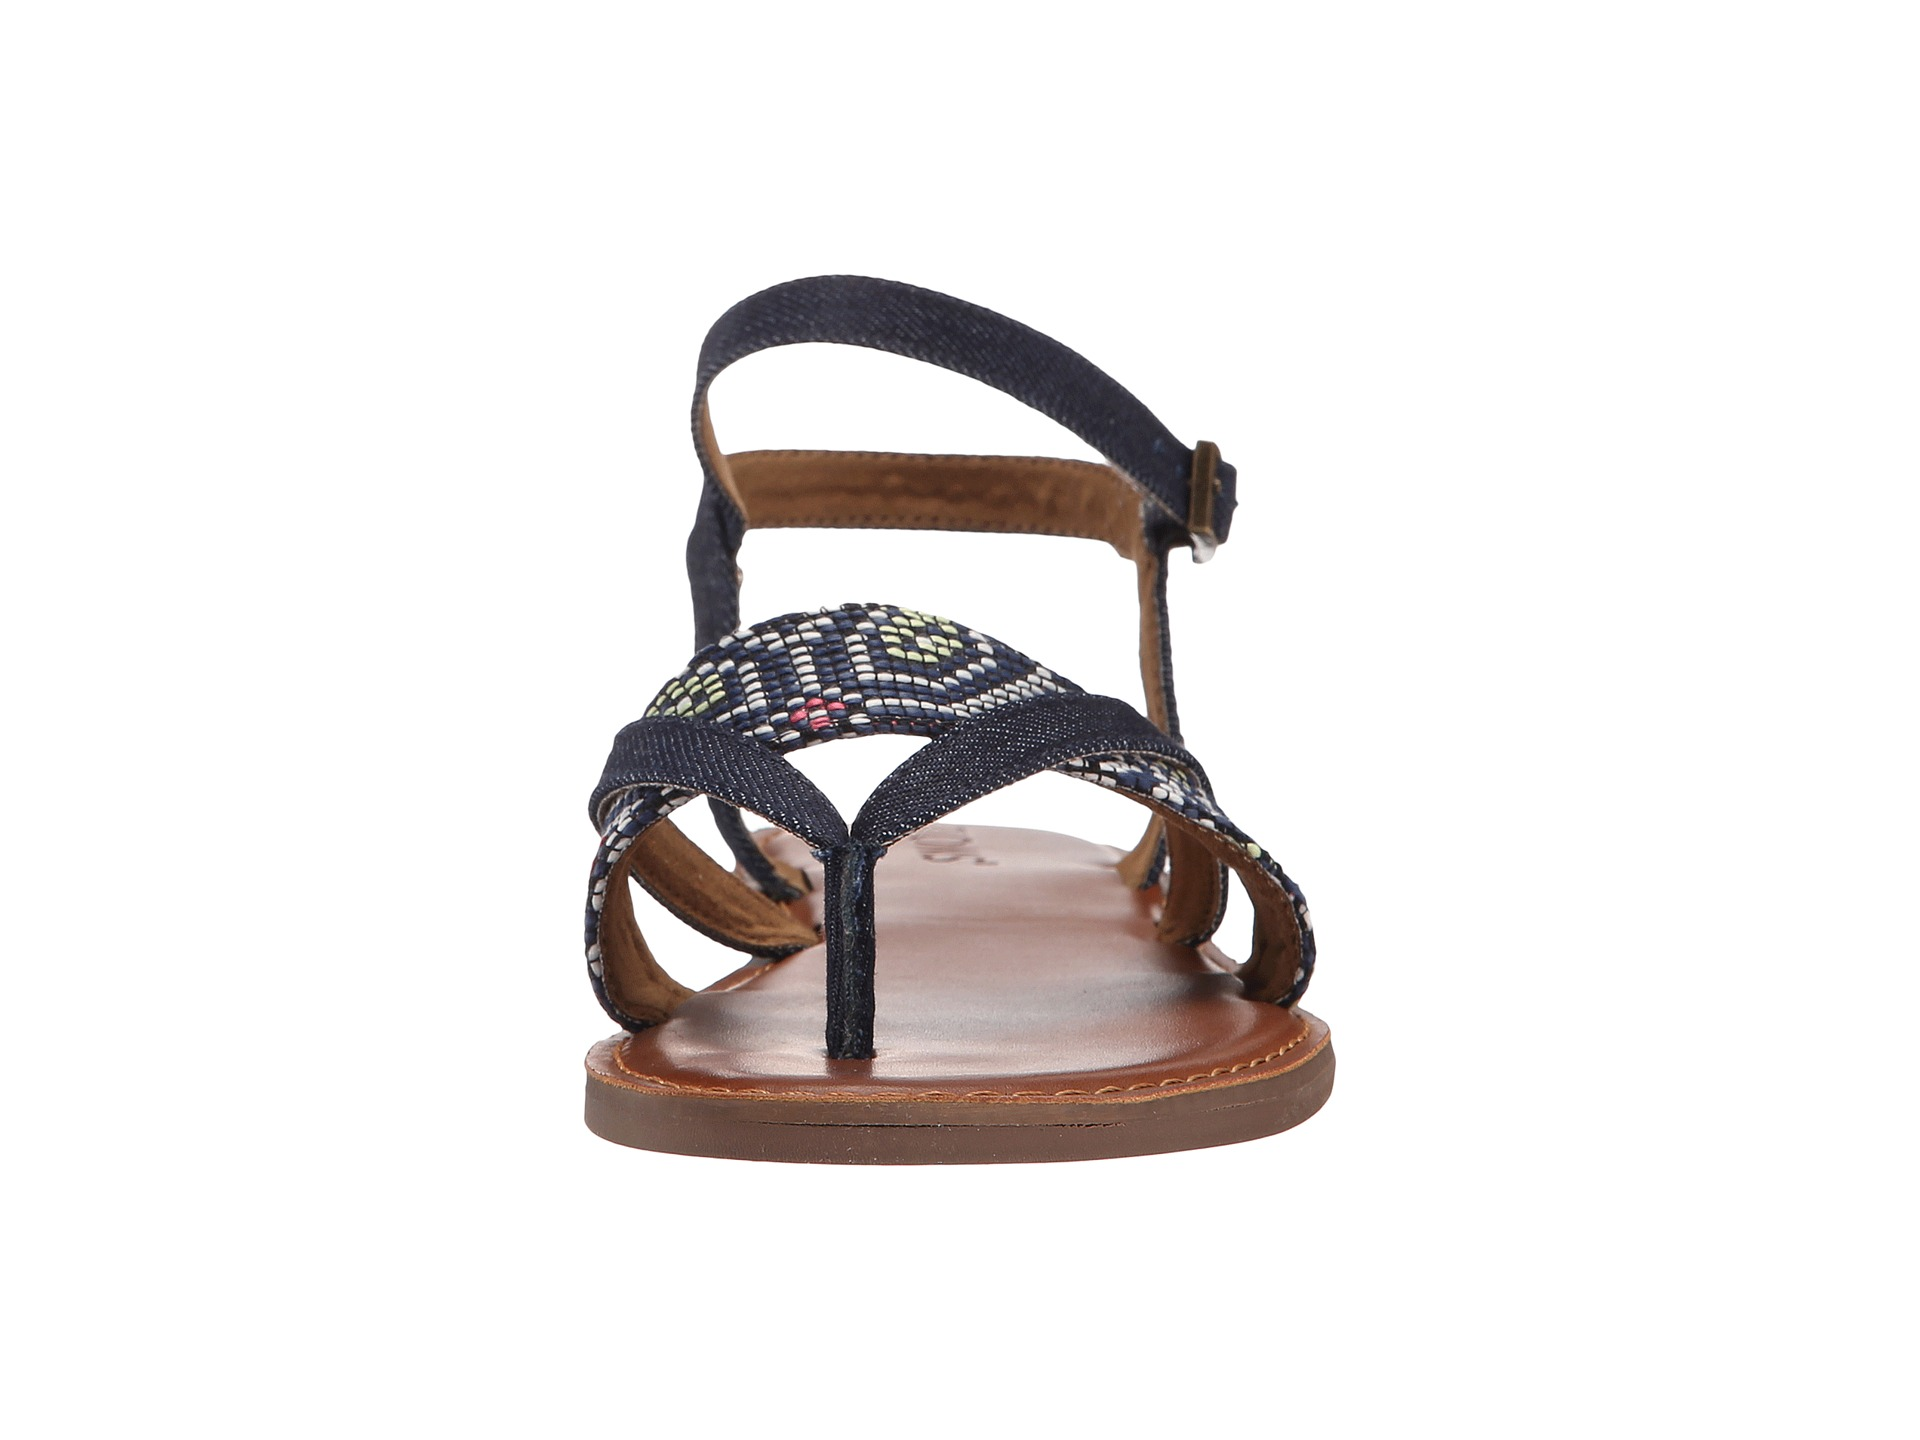 Toms Lexie Sandal Navy Multi Woven Zappos Com Free